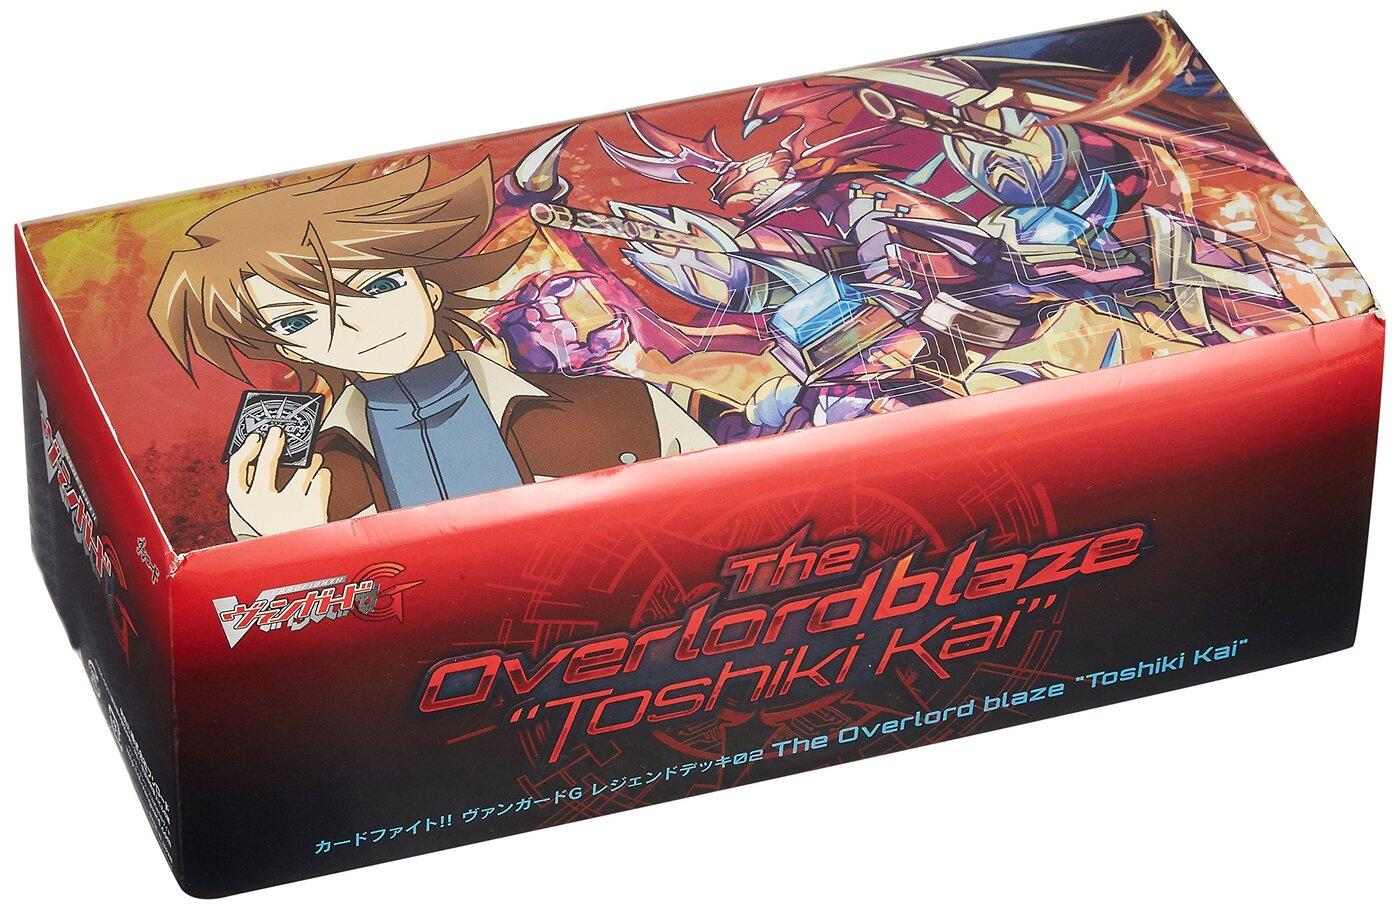 "Card Fight !! Vanguard G VG-G-LD02 Legend deck 2nd The Overlord blaze ""Toshiki Kai"" Japanese Ver."